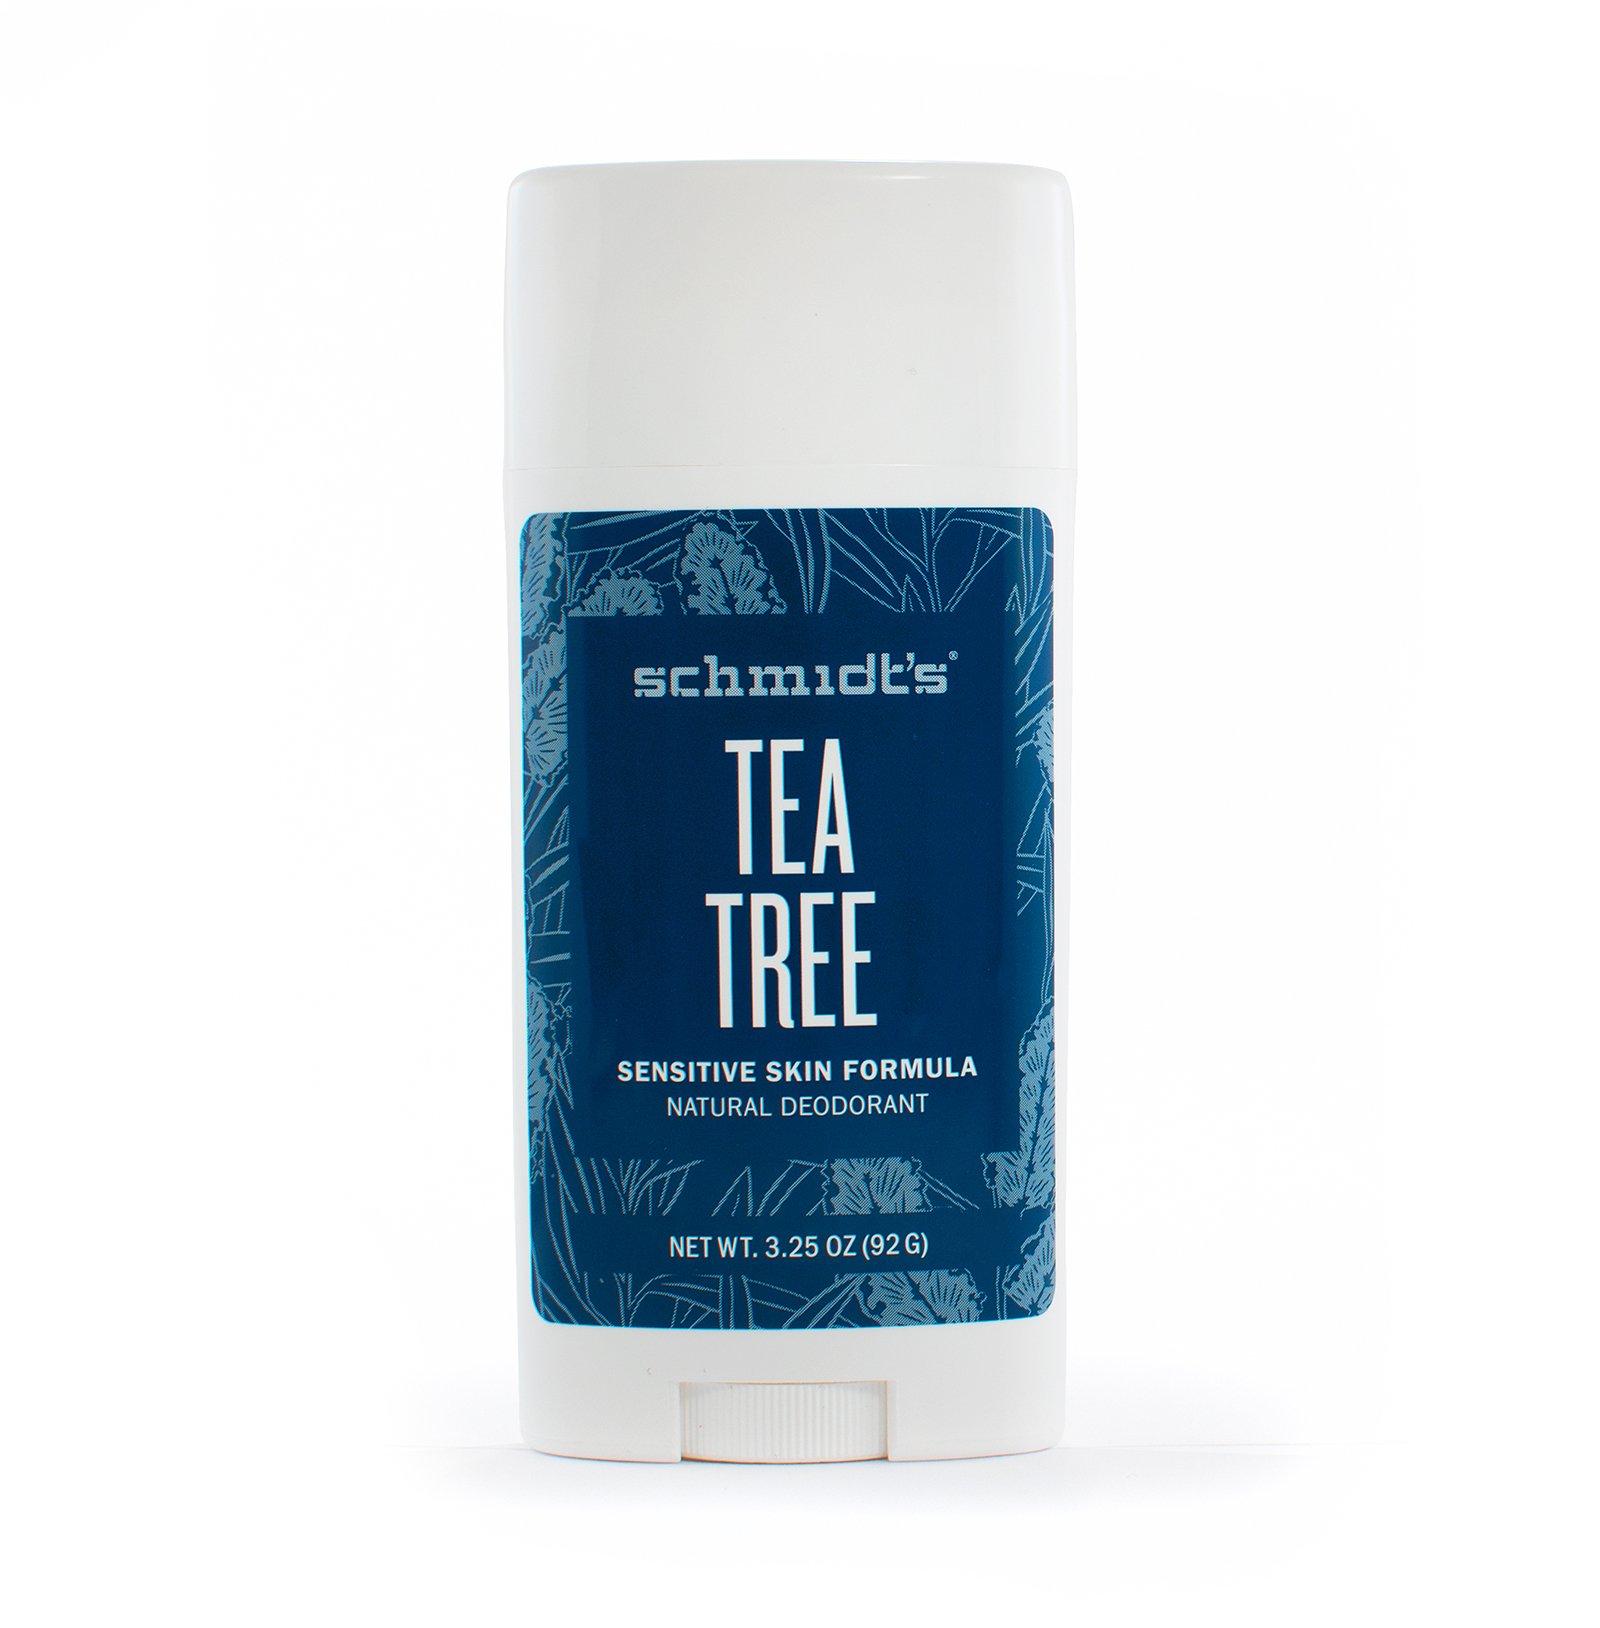 Schmidt's Natural Deodorant for Sensitive Skin - Tea Tree, 3.25 ounces. Stick for Women and Men by Schmidt's Deodorant (Image #4)